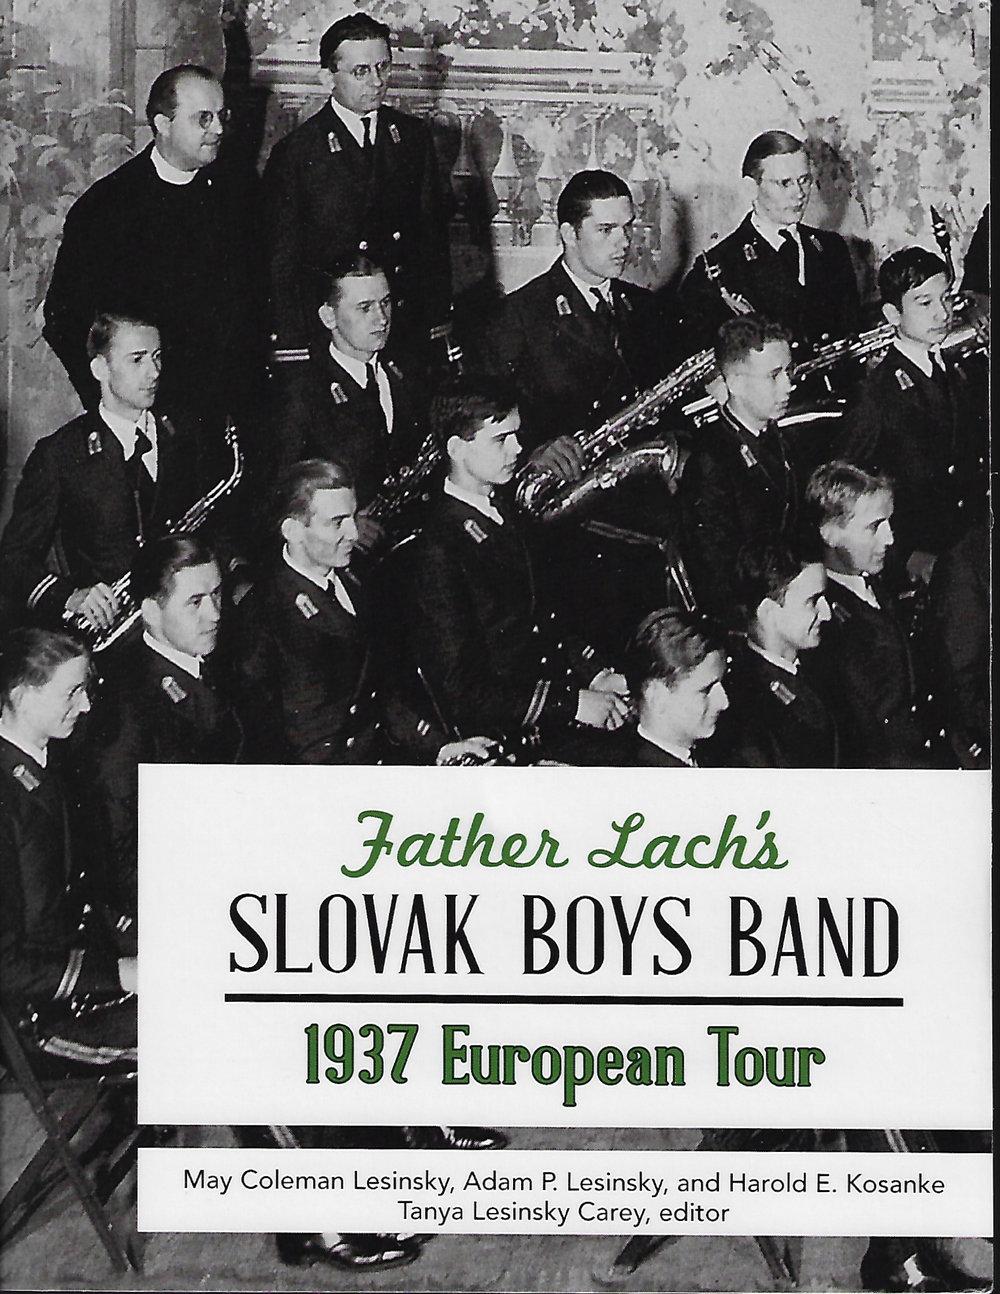 Father Lach's Slovak Boys Band 1937 European Tour